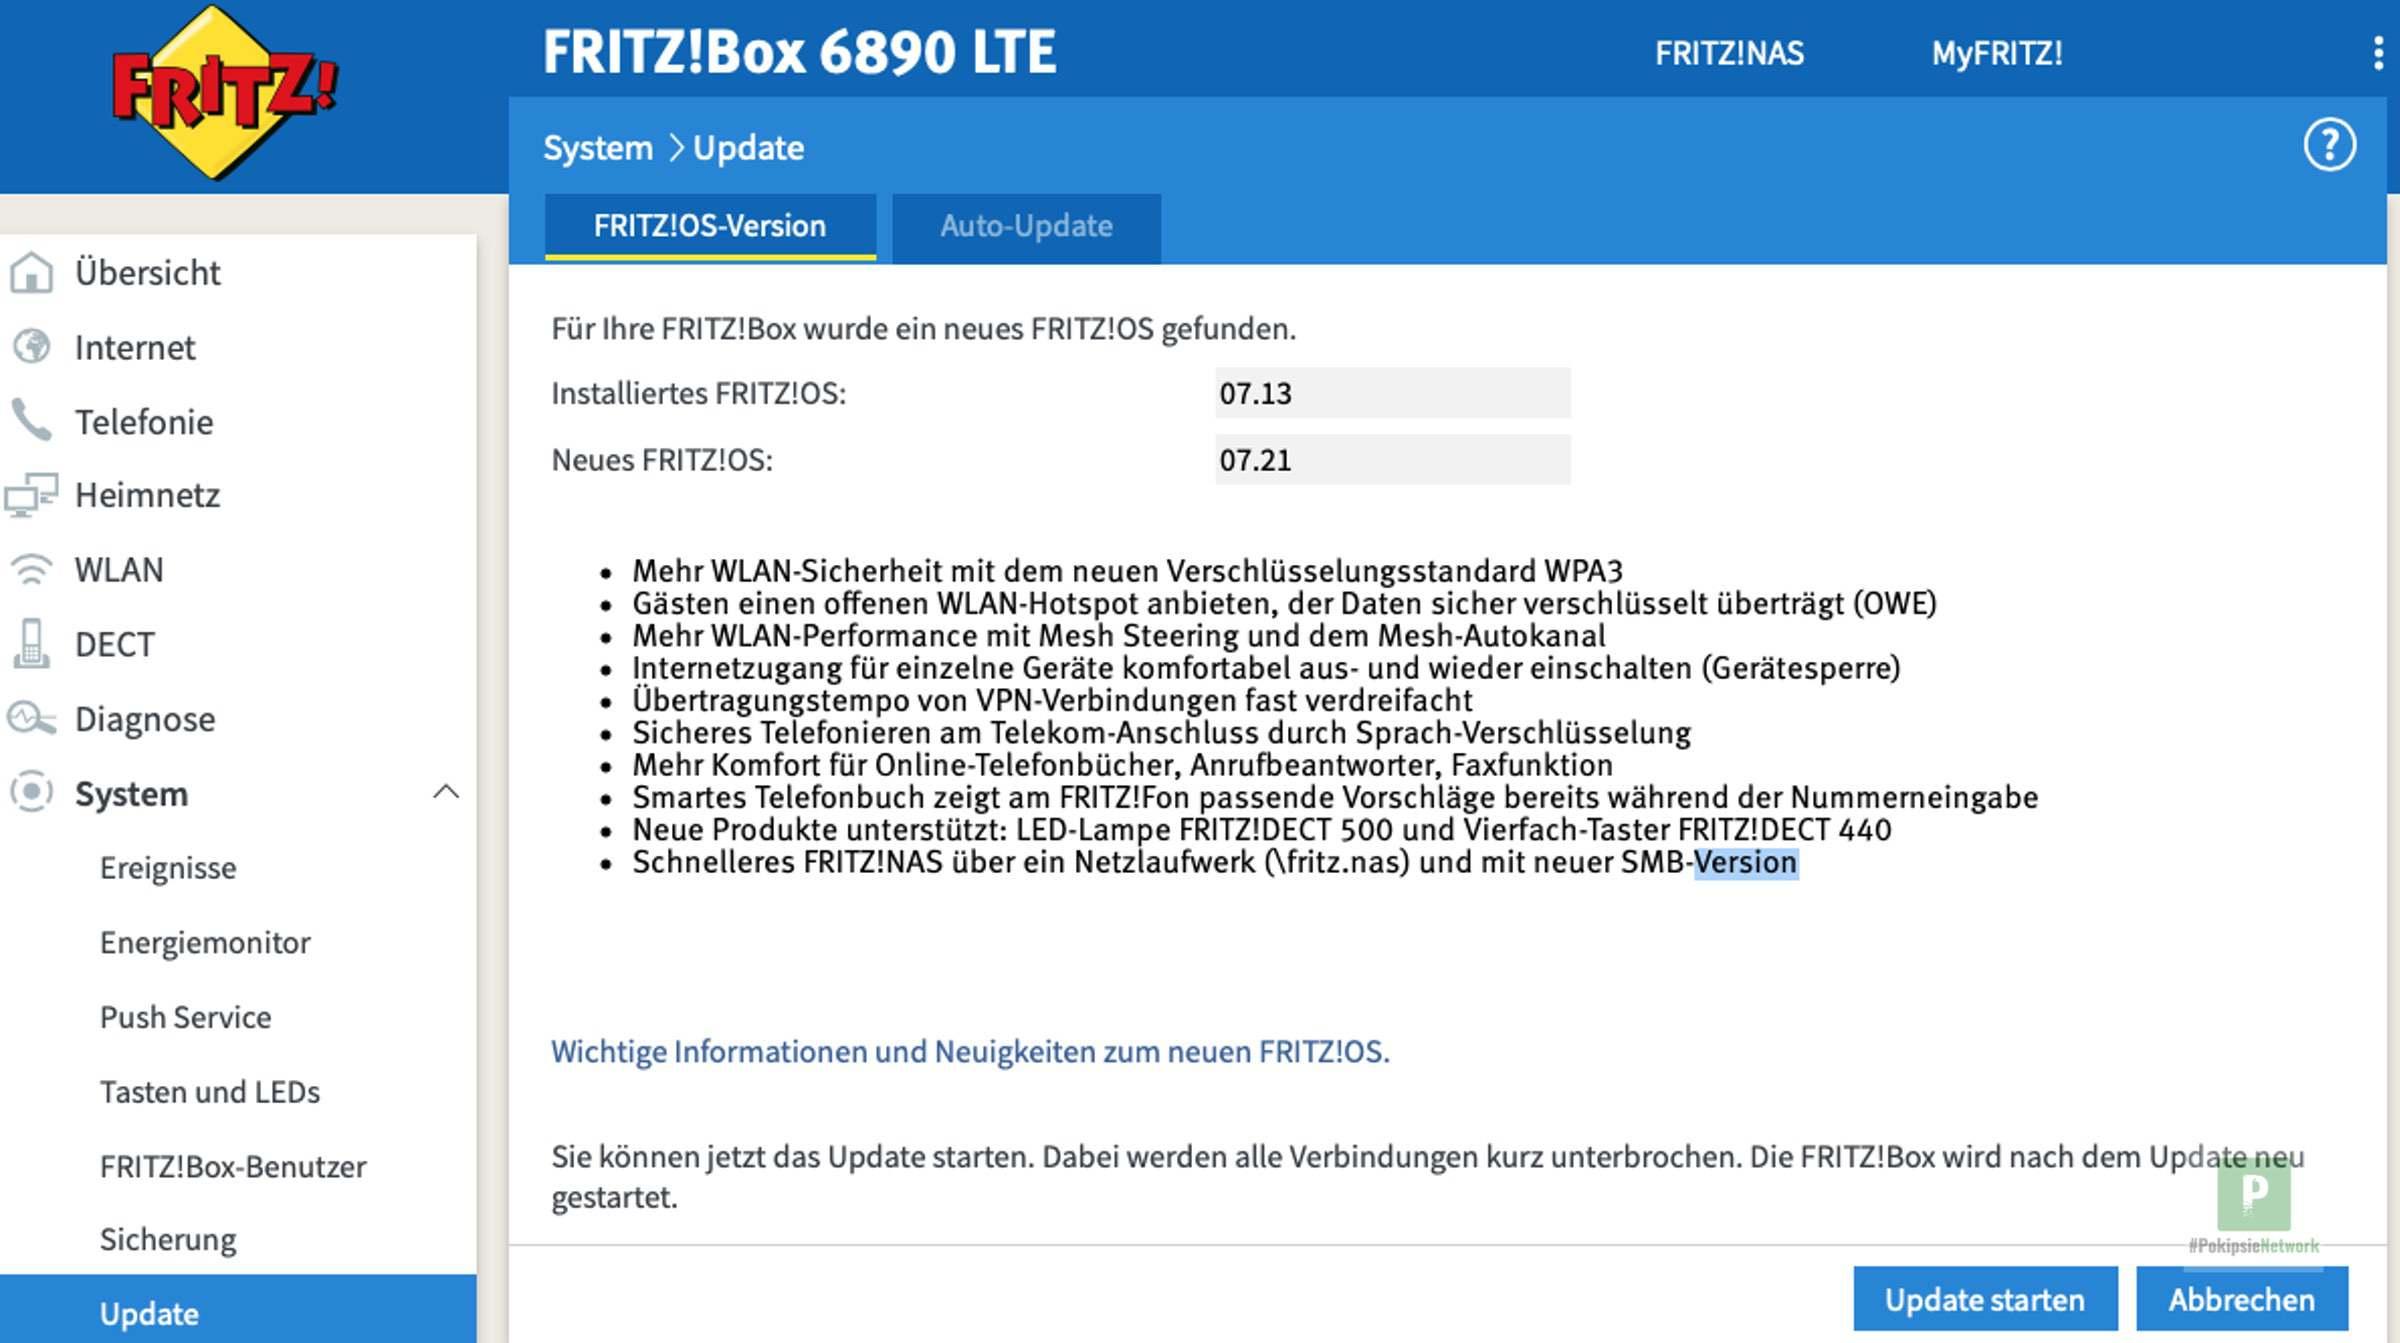 FRITZ!OS 7.21